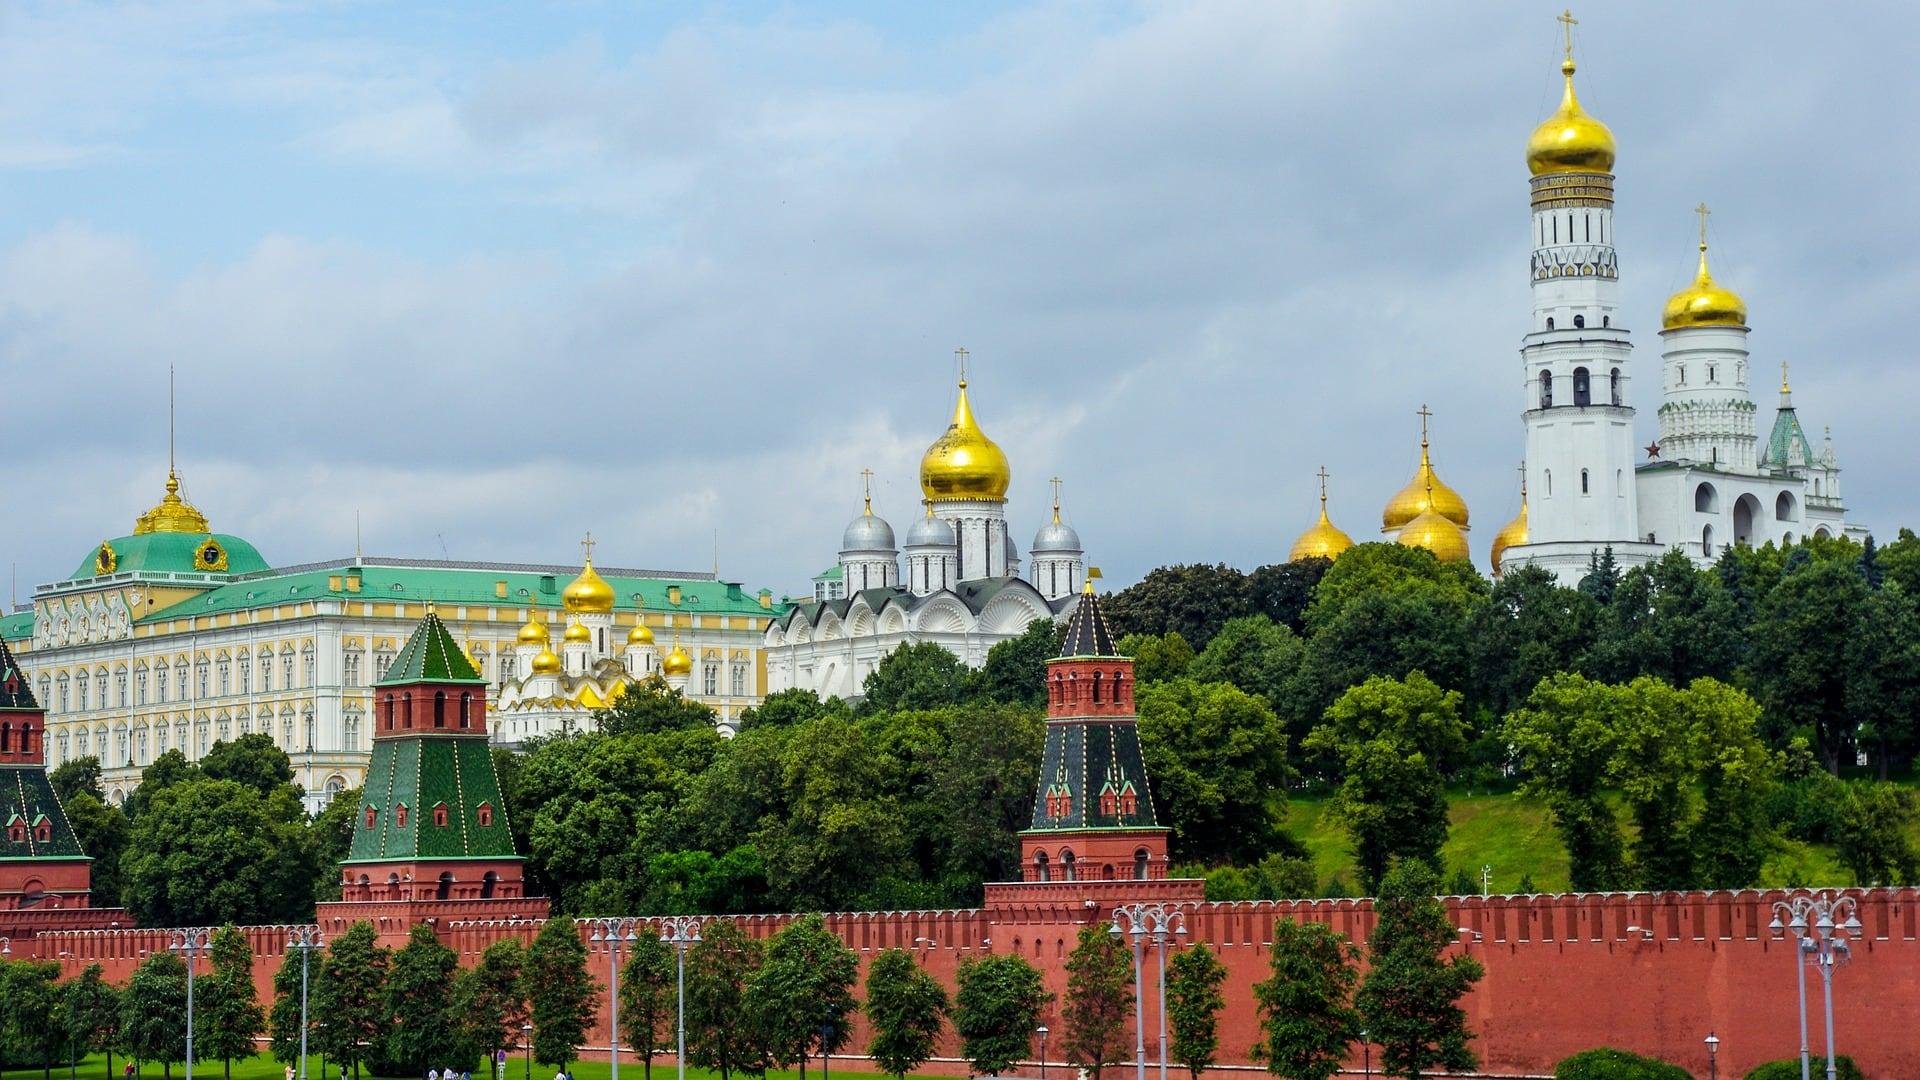 kremlin-3393439_1920.jpg